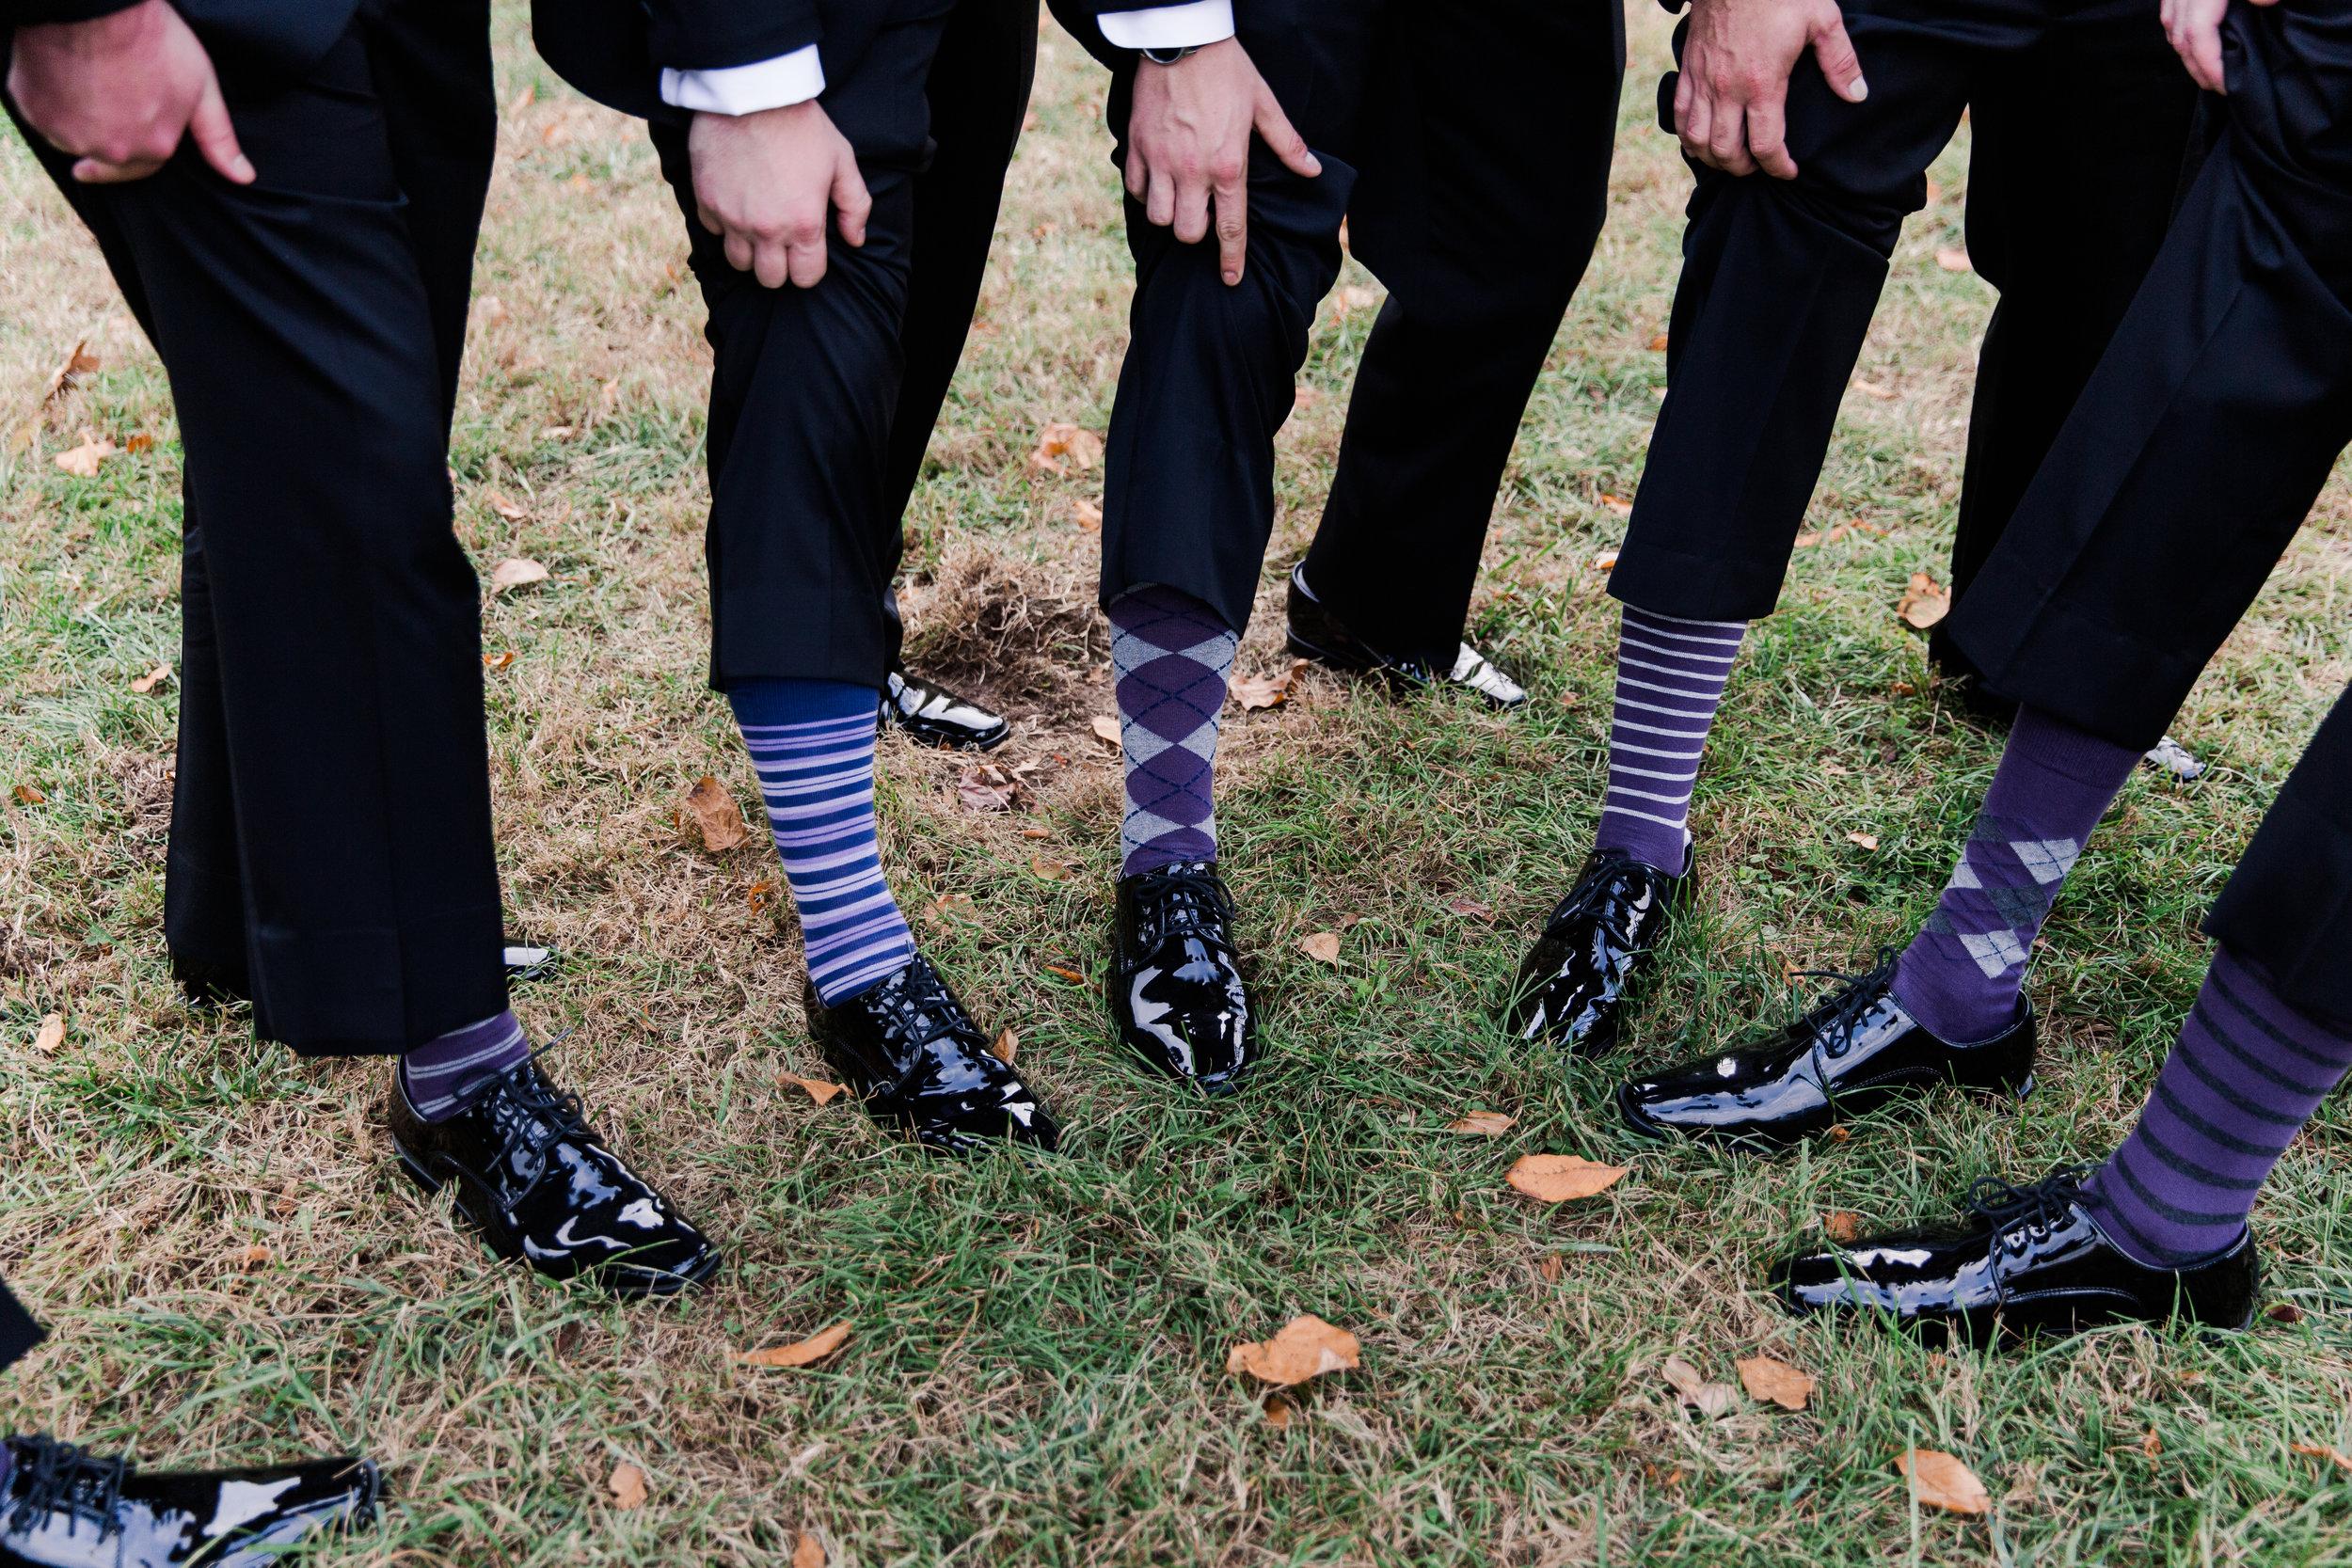 DavidAmandaMundy-Wedding-10282017-KathrynIvyPhotography-321.jpg